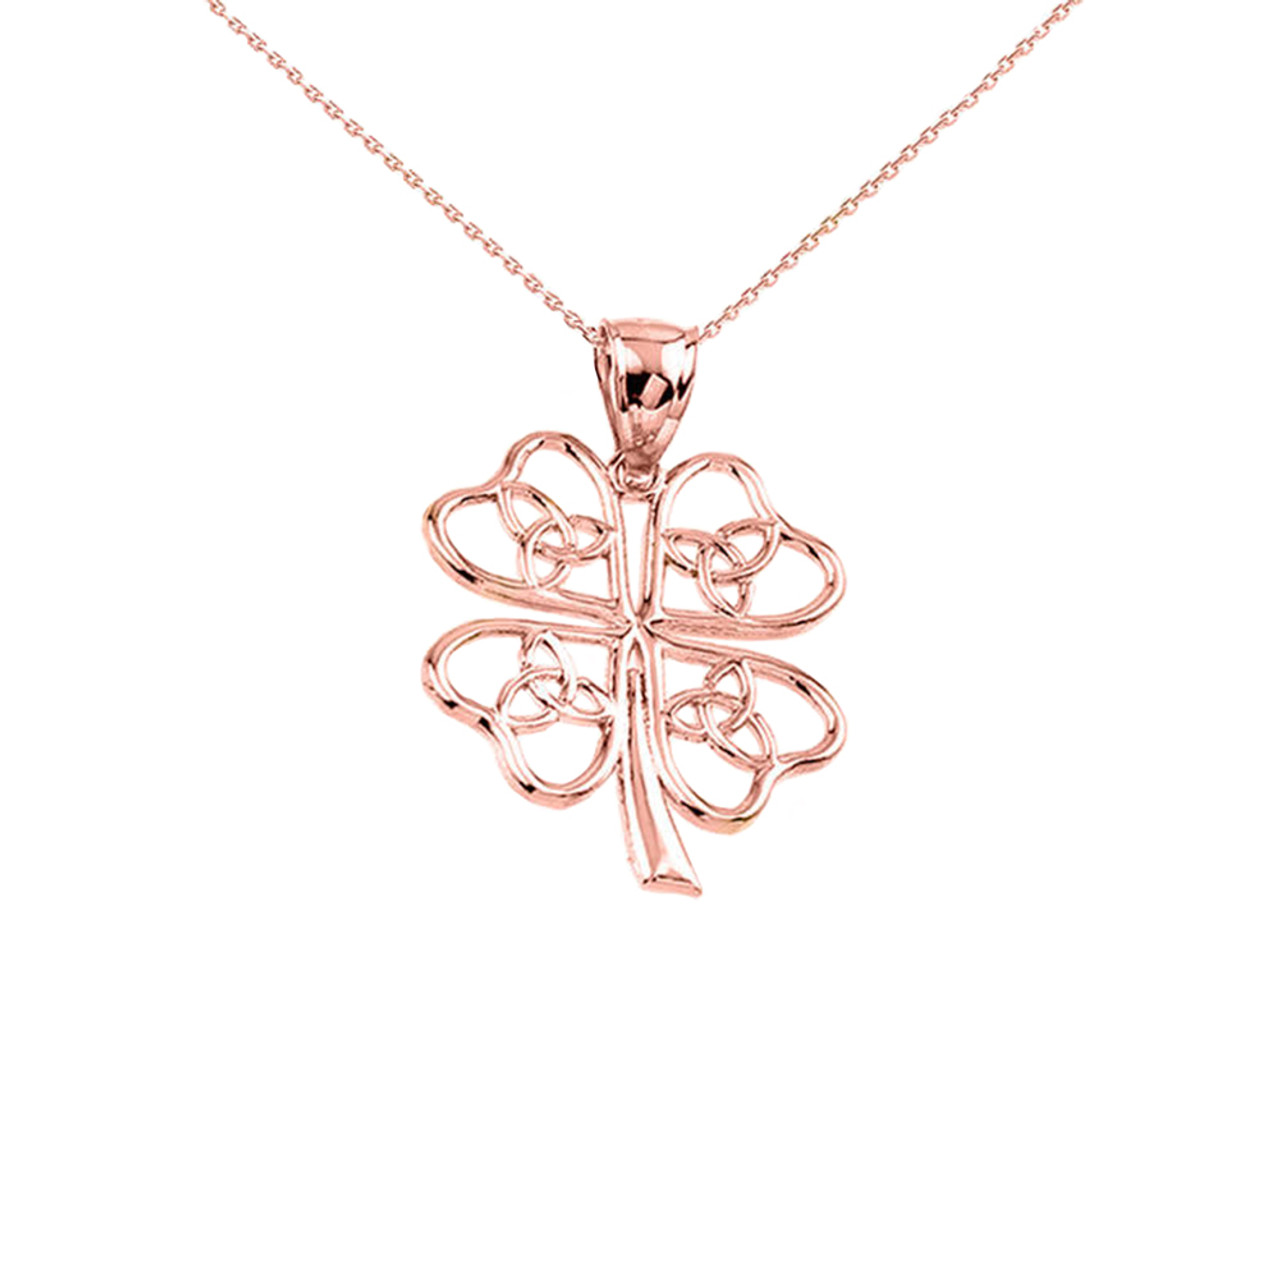 Rose gold celtic trinity knot clover pendant rose gold celtic trinity knot clover pendant necklace aloadofball Choice Image